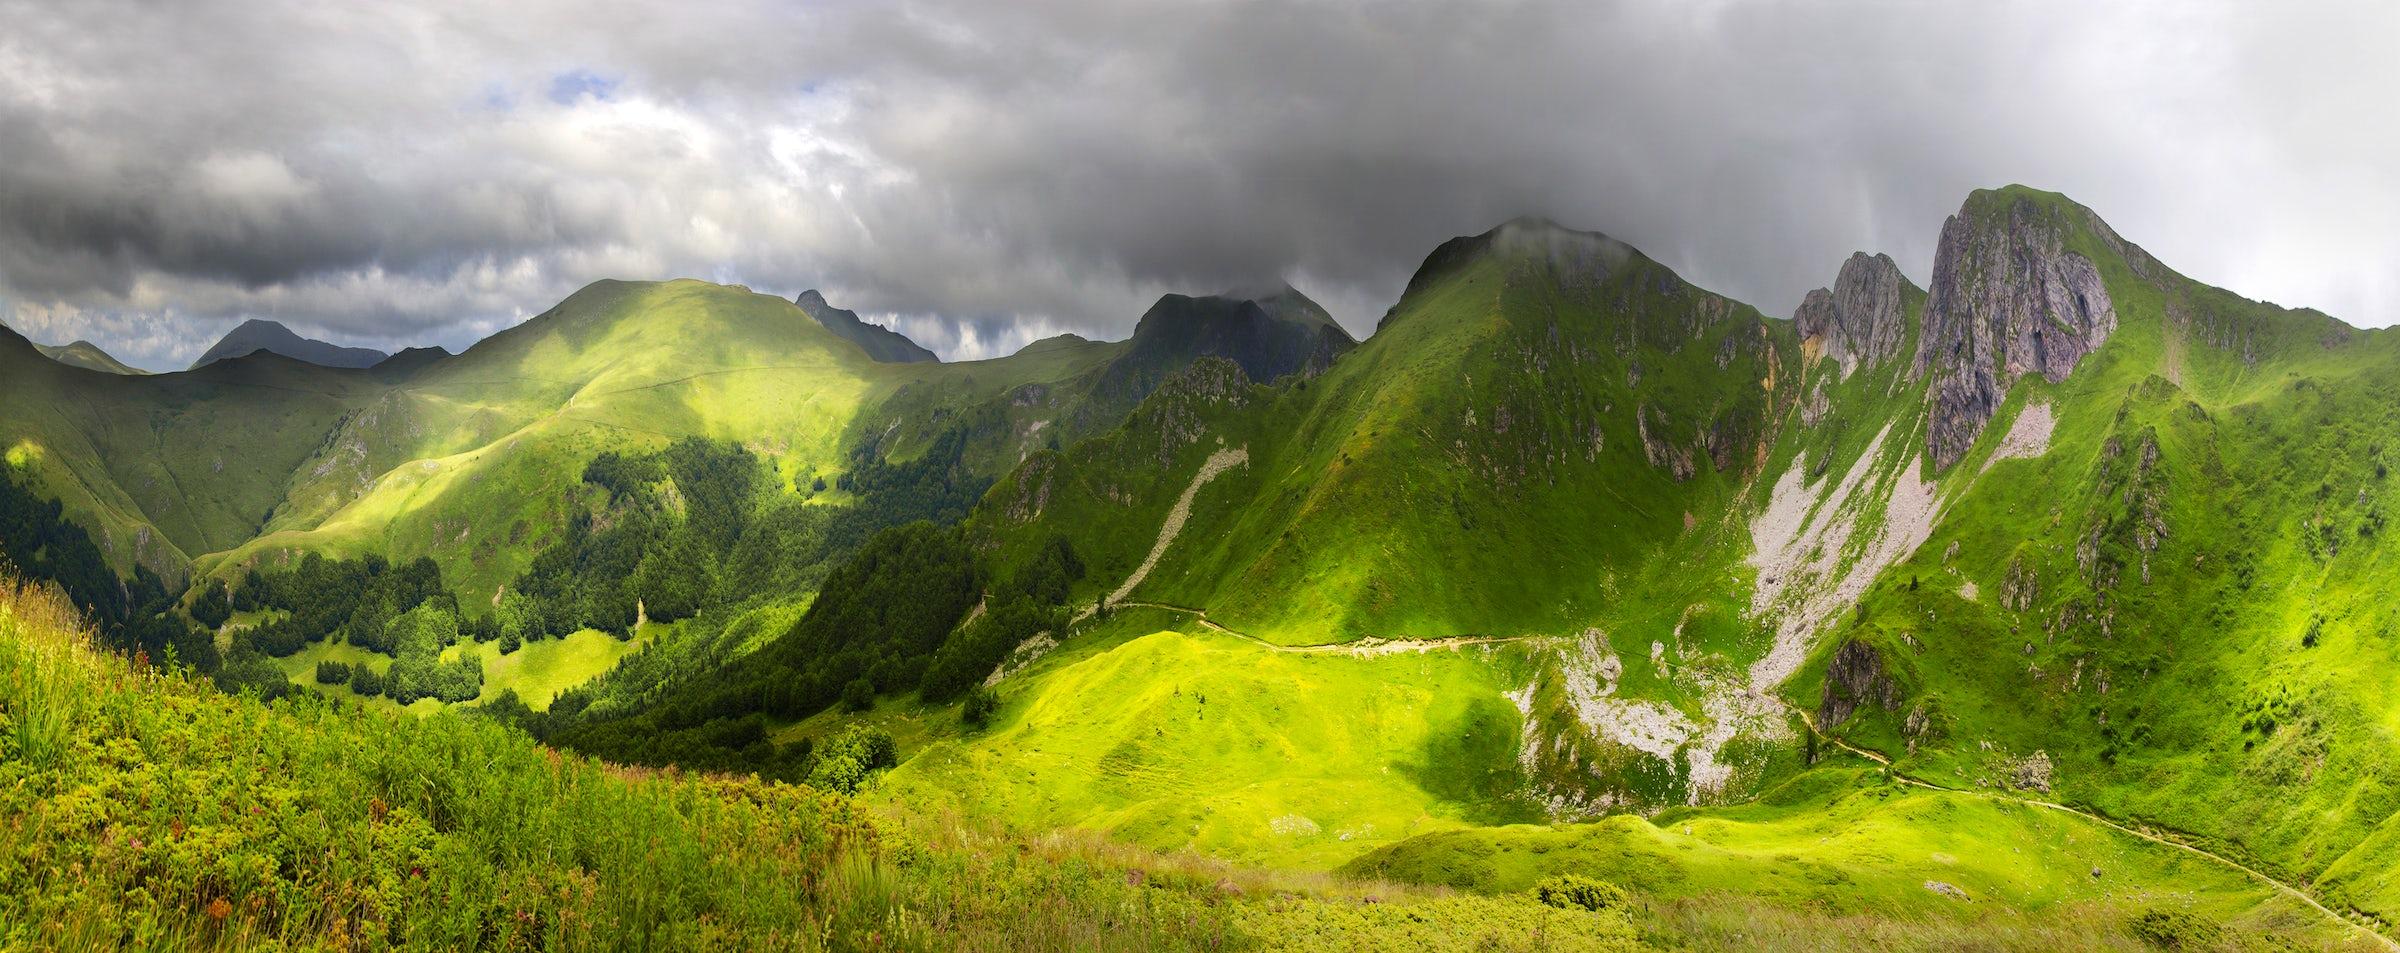 Hiking the mount Bjelasica